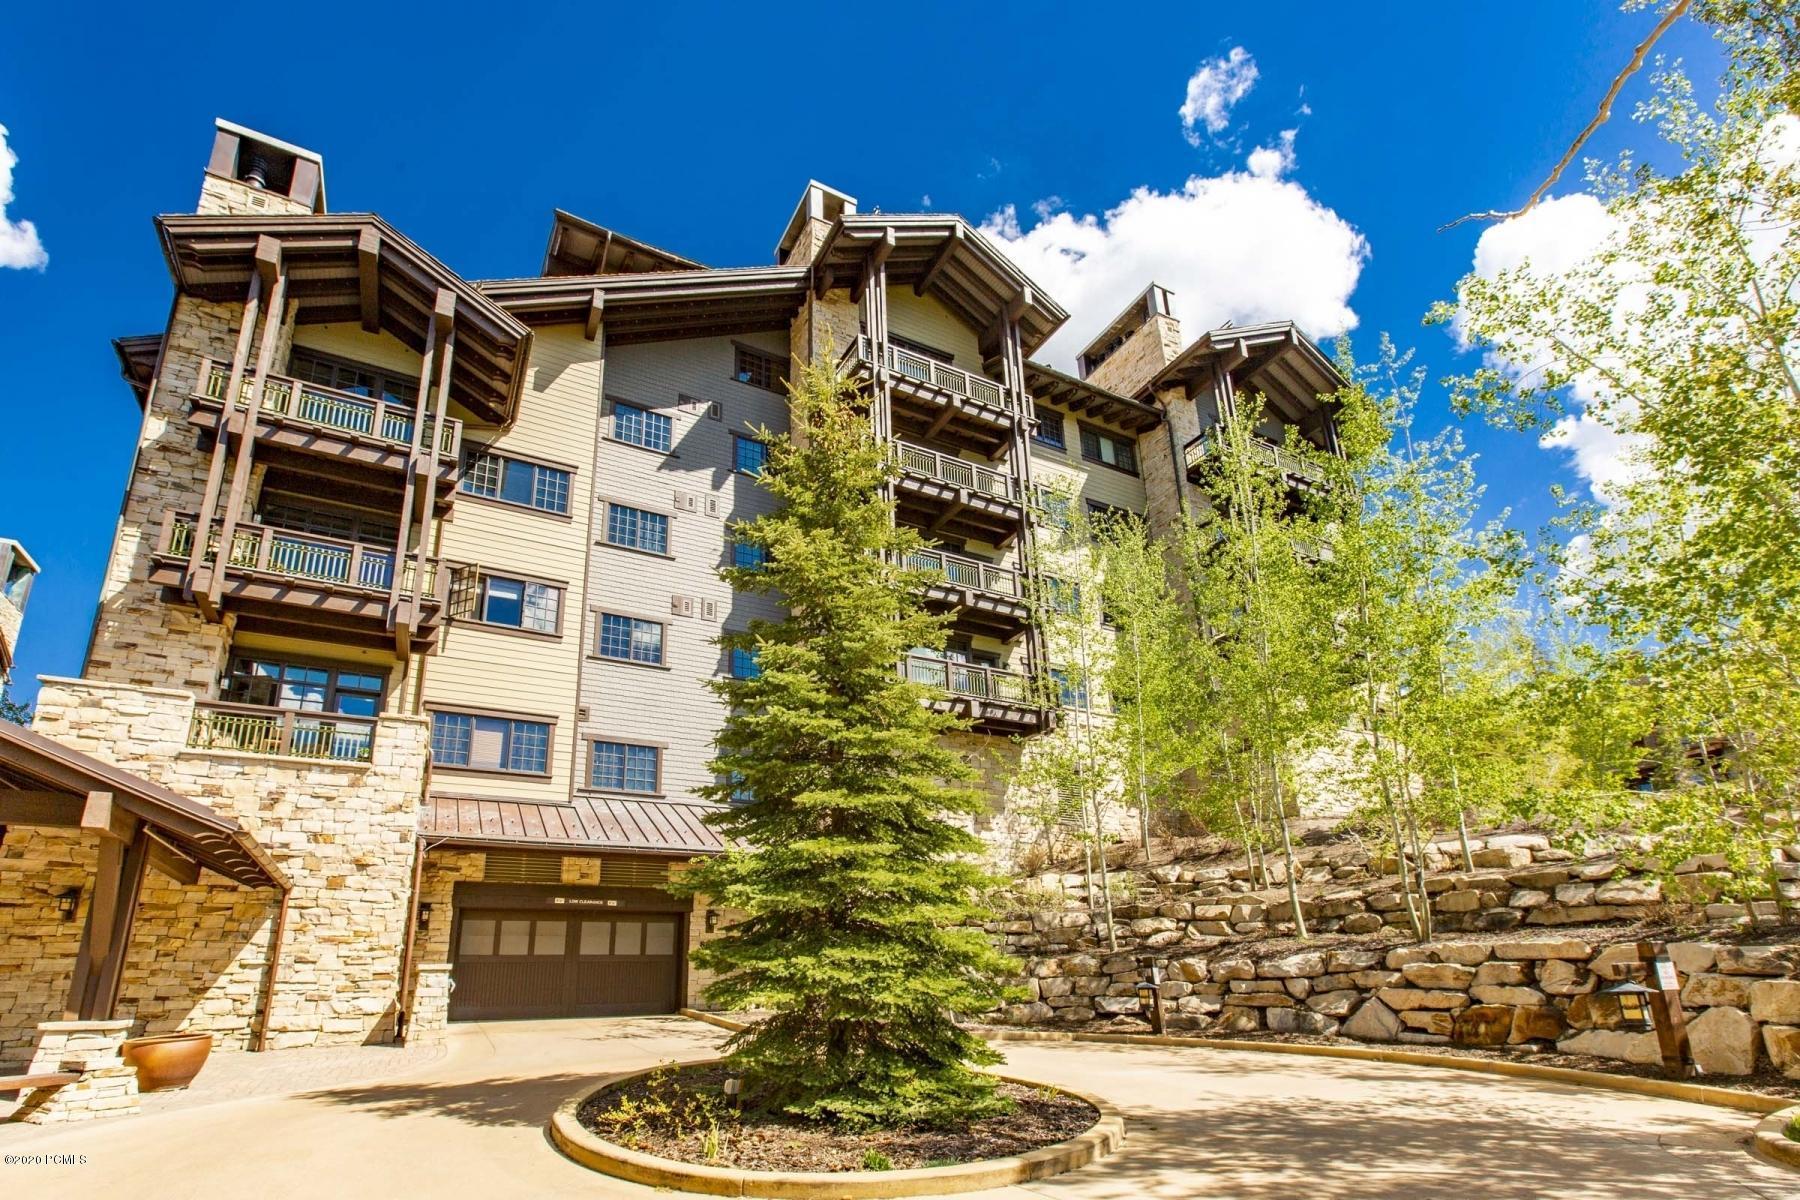 8886 Empire Club Drive, Park City, Utah 84060, 2 Bedrooms Bedrooms, ,3 BathroomsBathrooms,Condominium,For Sale,Empire Club,11908660